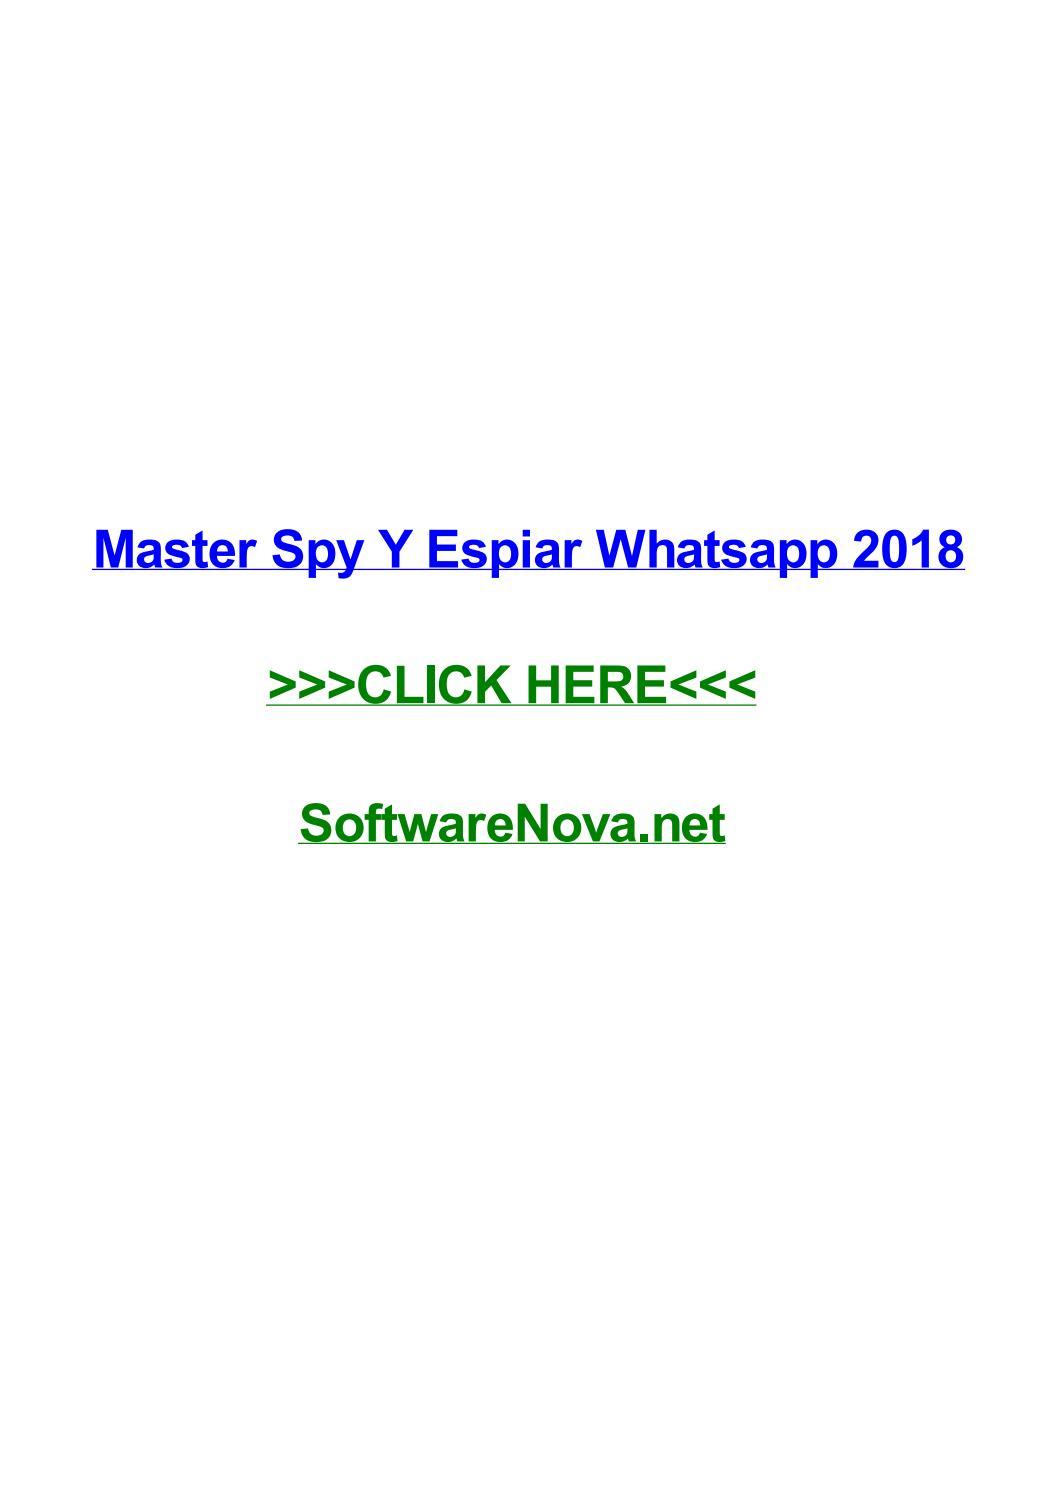 Técnicas más comunes de espionaje en celulares